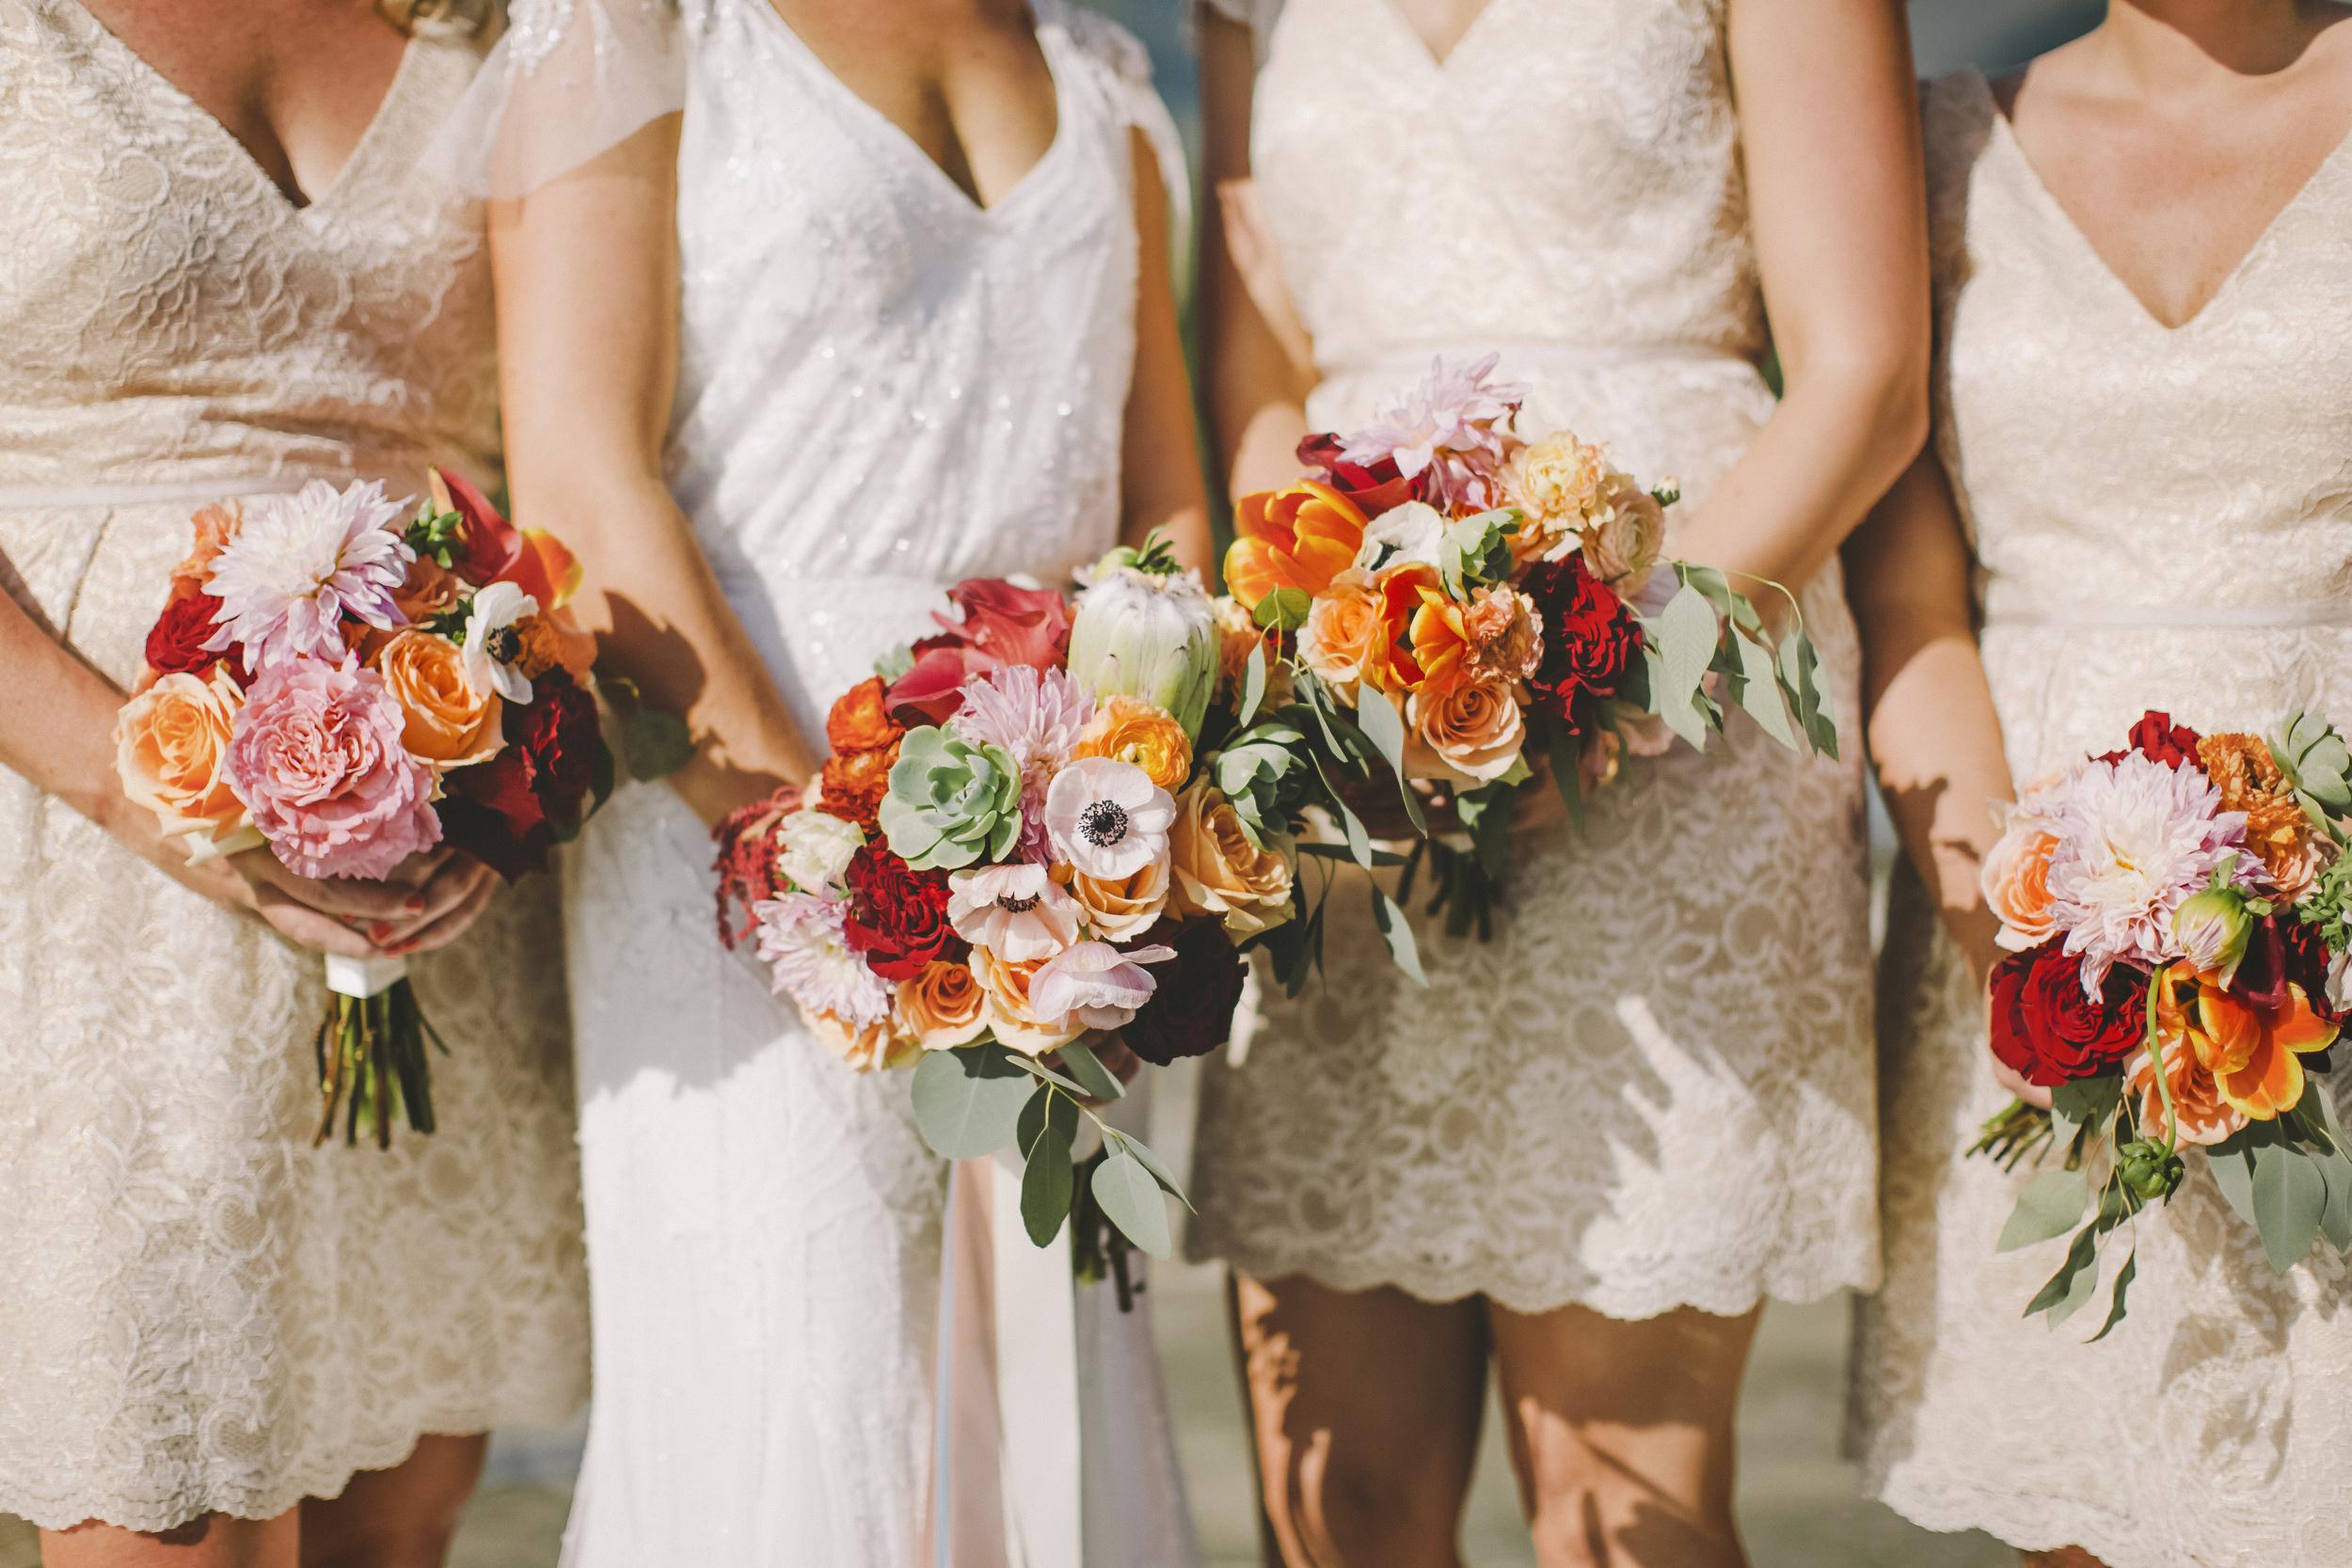 angie-diaz-photography-maui-wedding-mel-matt-65.jpeg